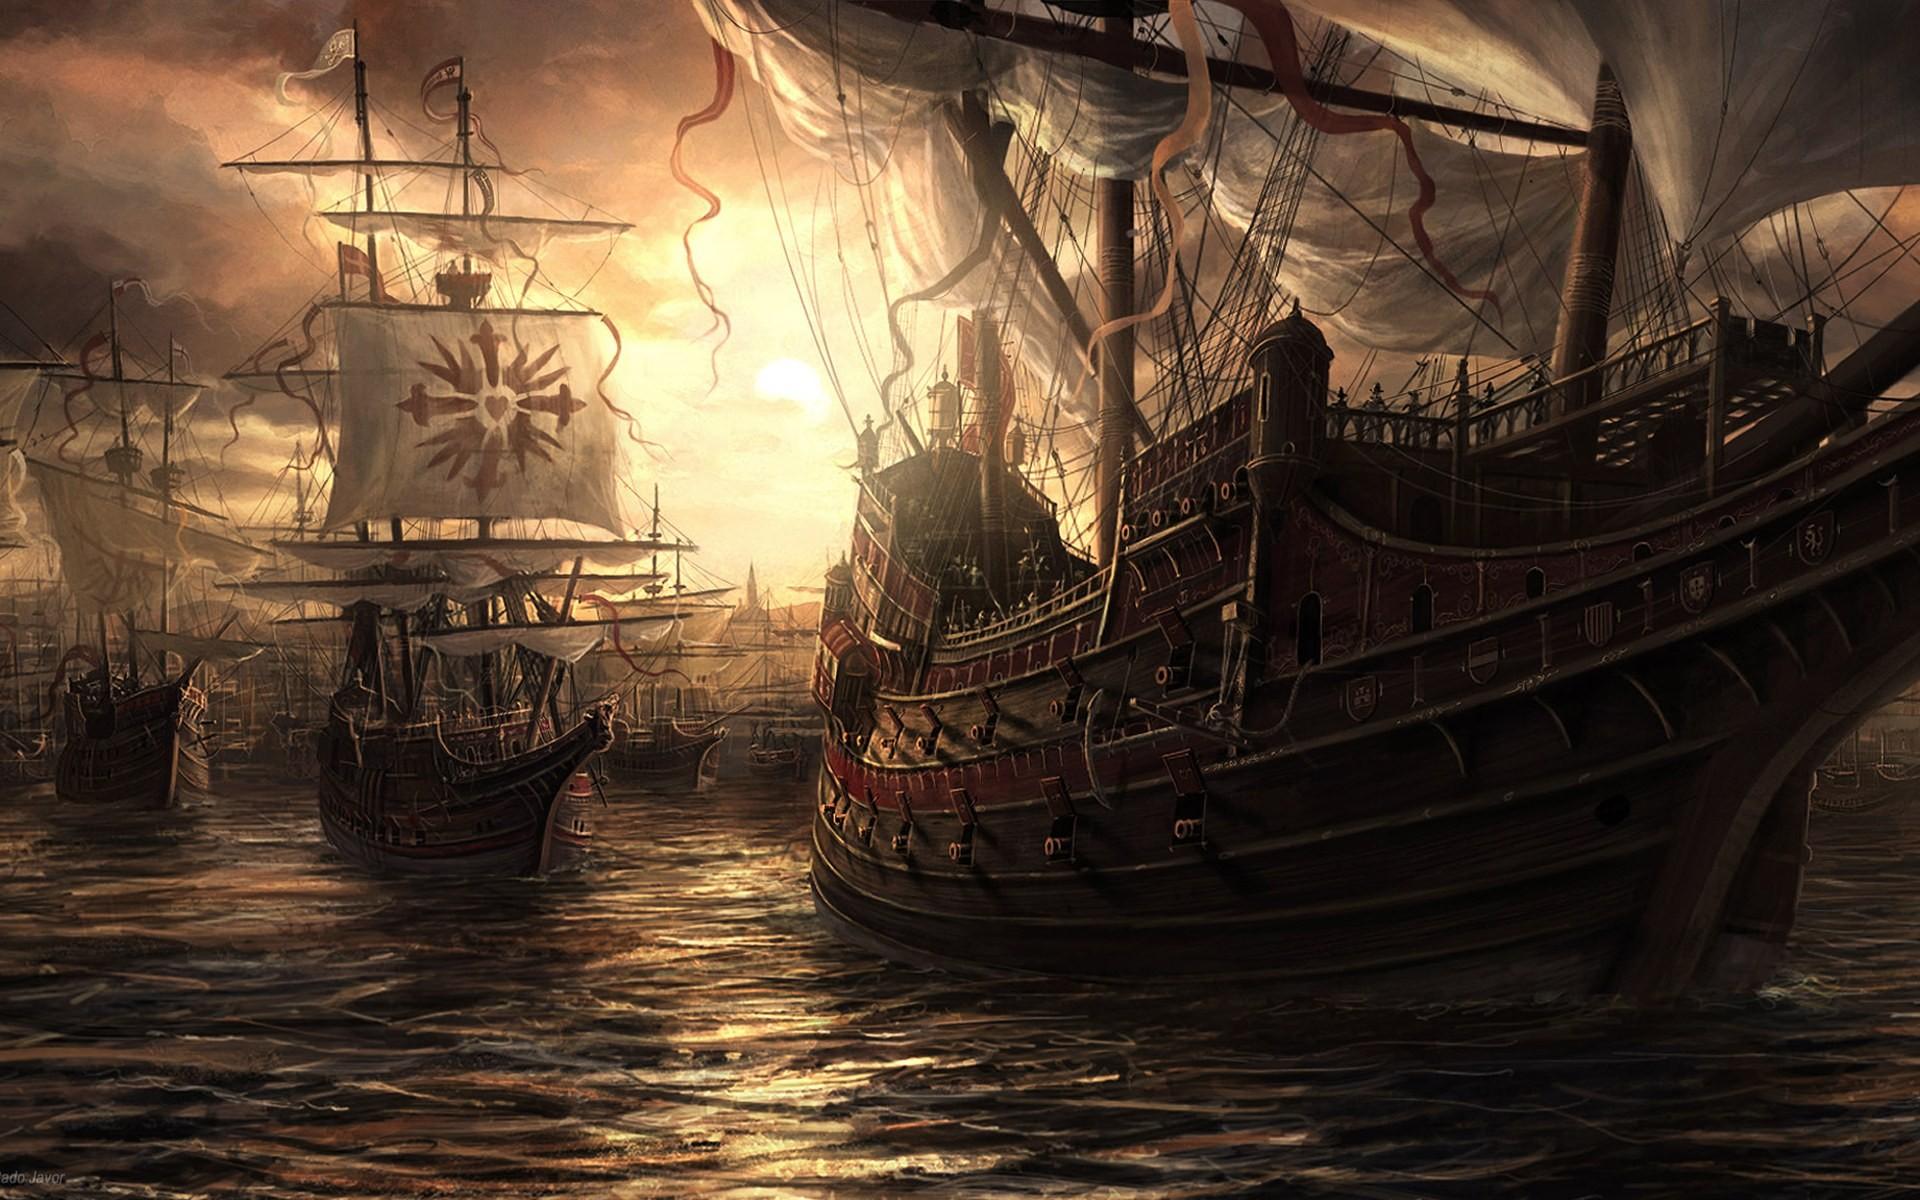 пара спит пиратские корабли фото картинки фэнтези рабочий стол картинки